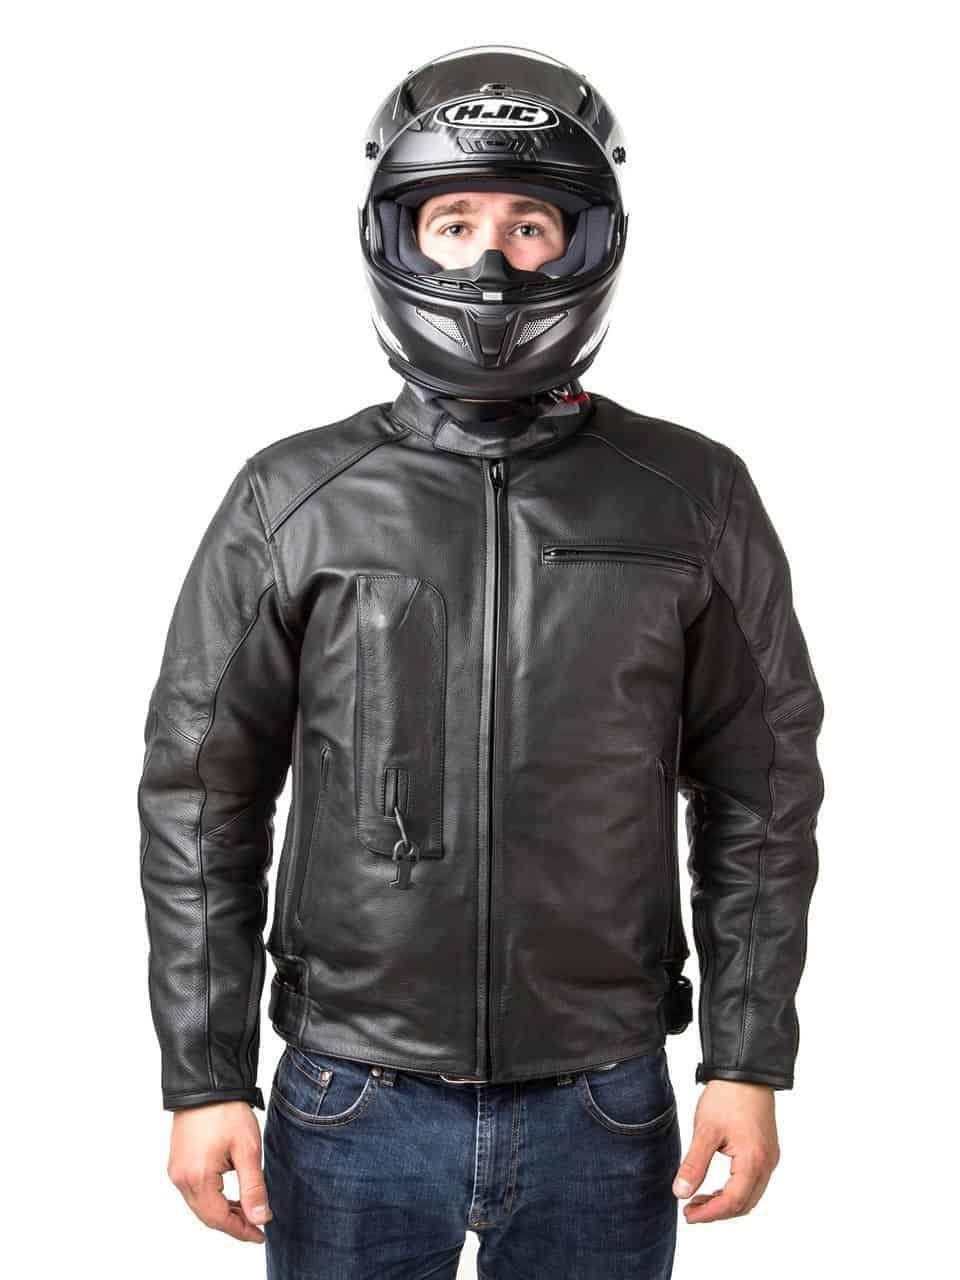 Helite Leather Jacket in Black